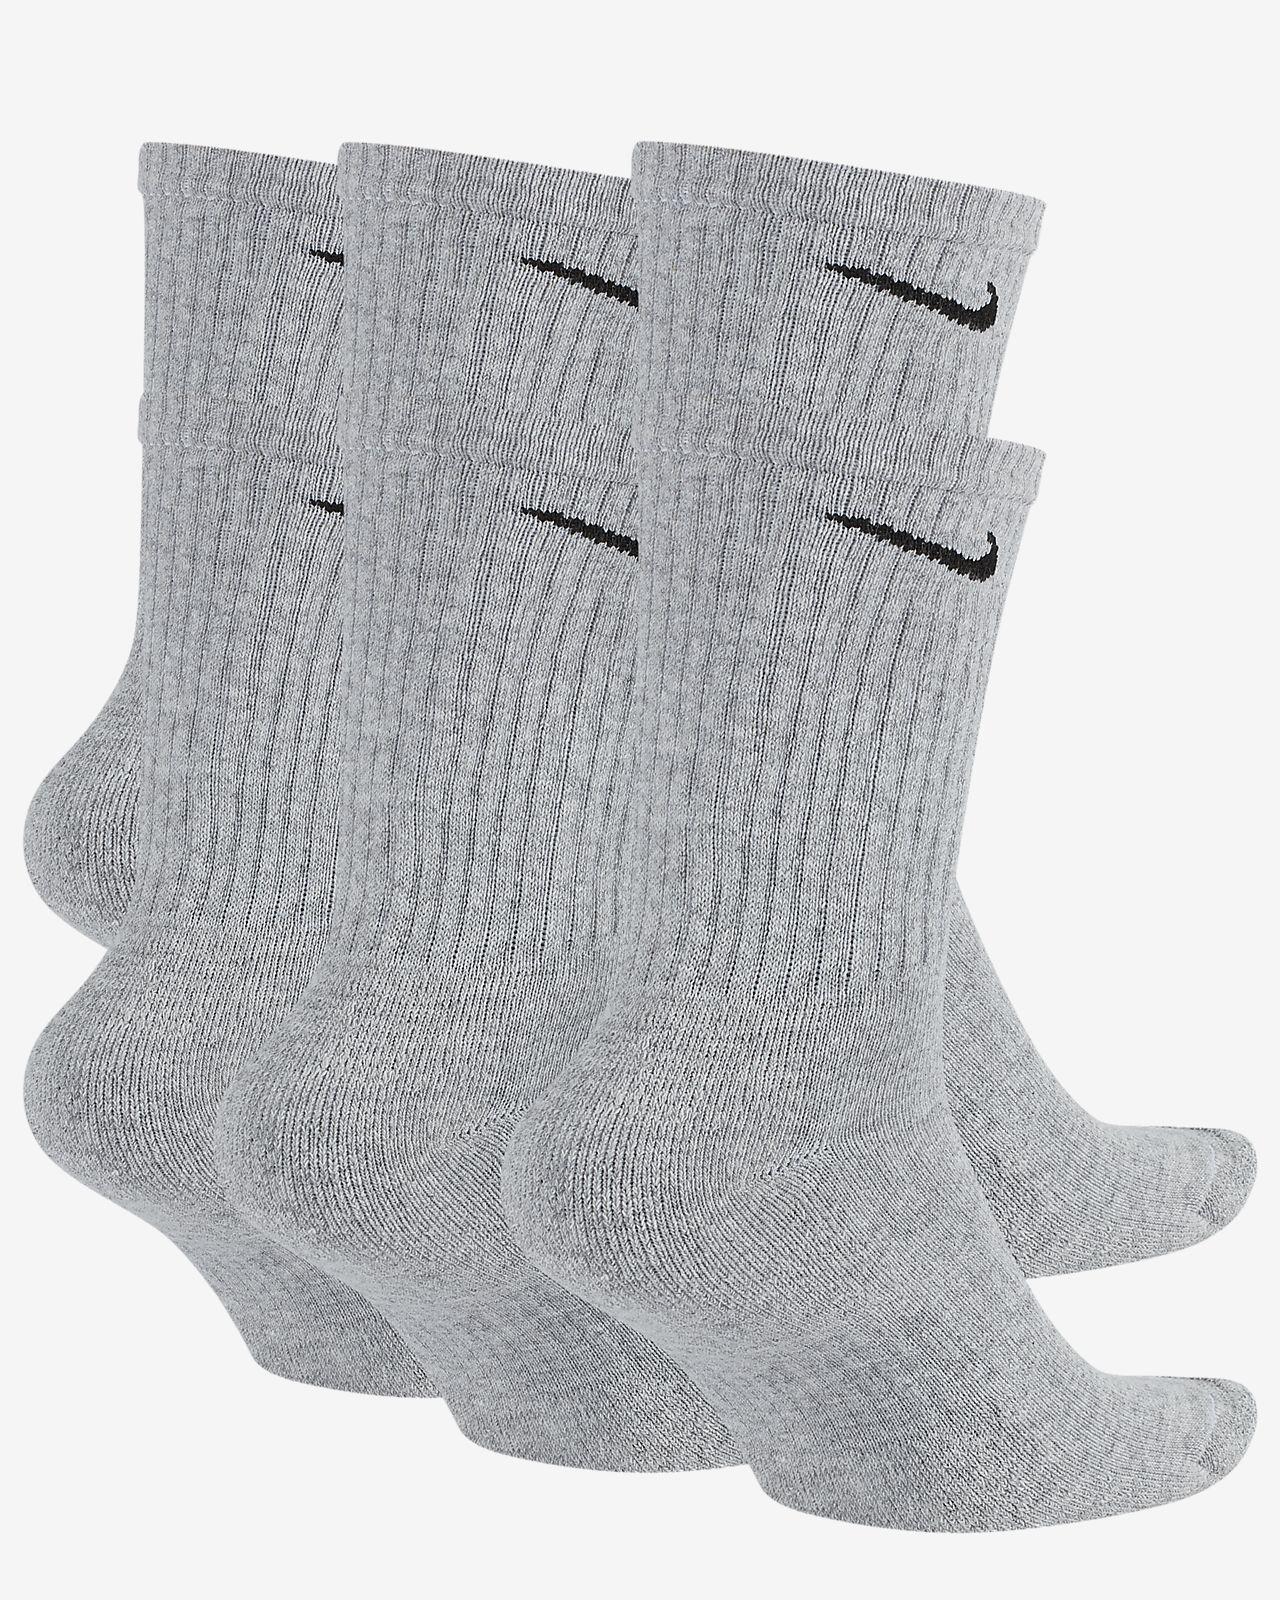 42145337789a7 Nike Everyday Cushioned Training Crew Socks (6 Pairs)